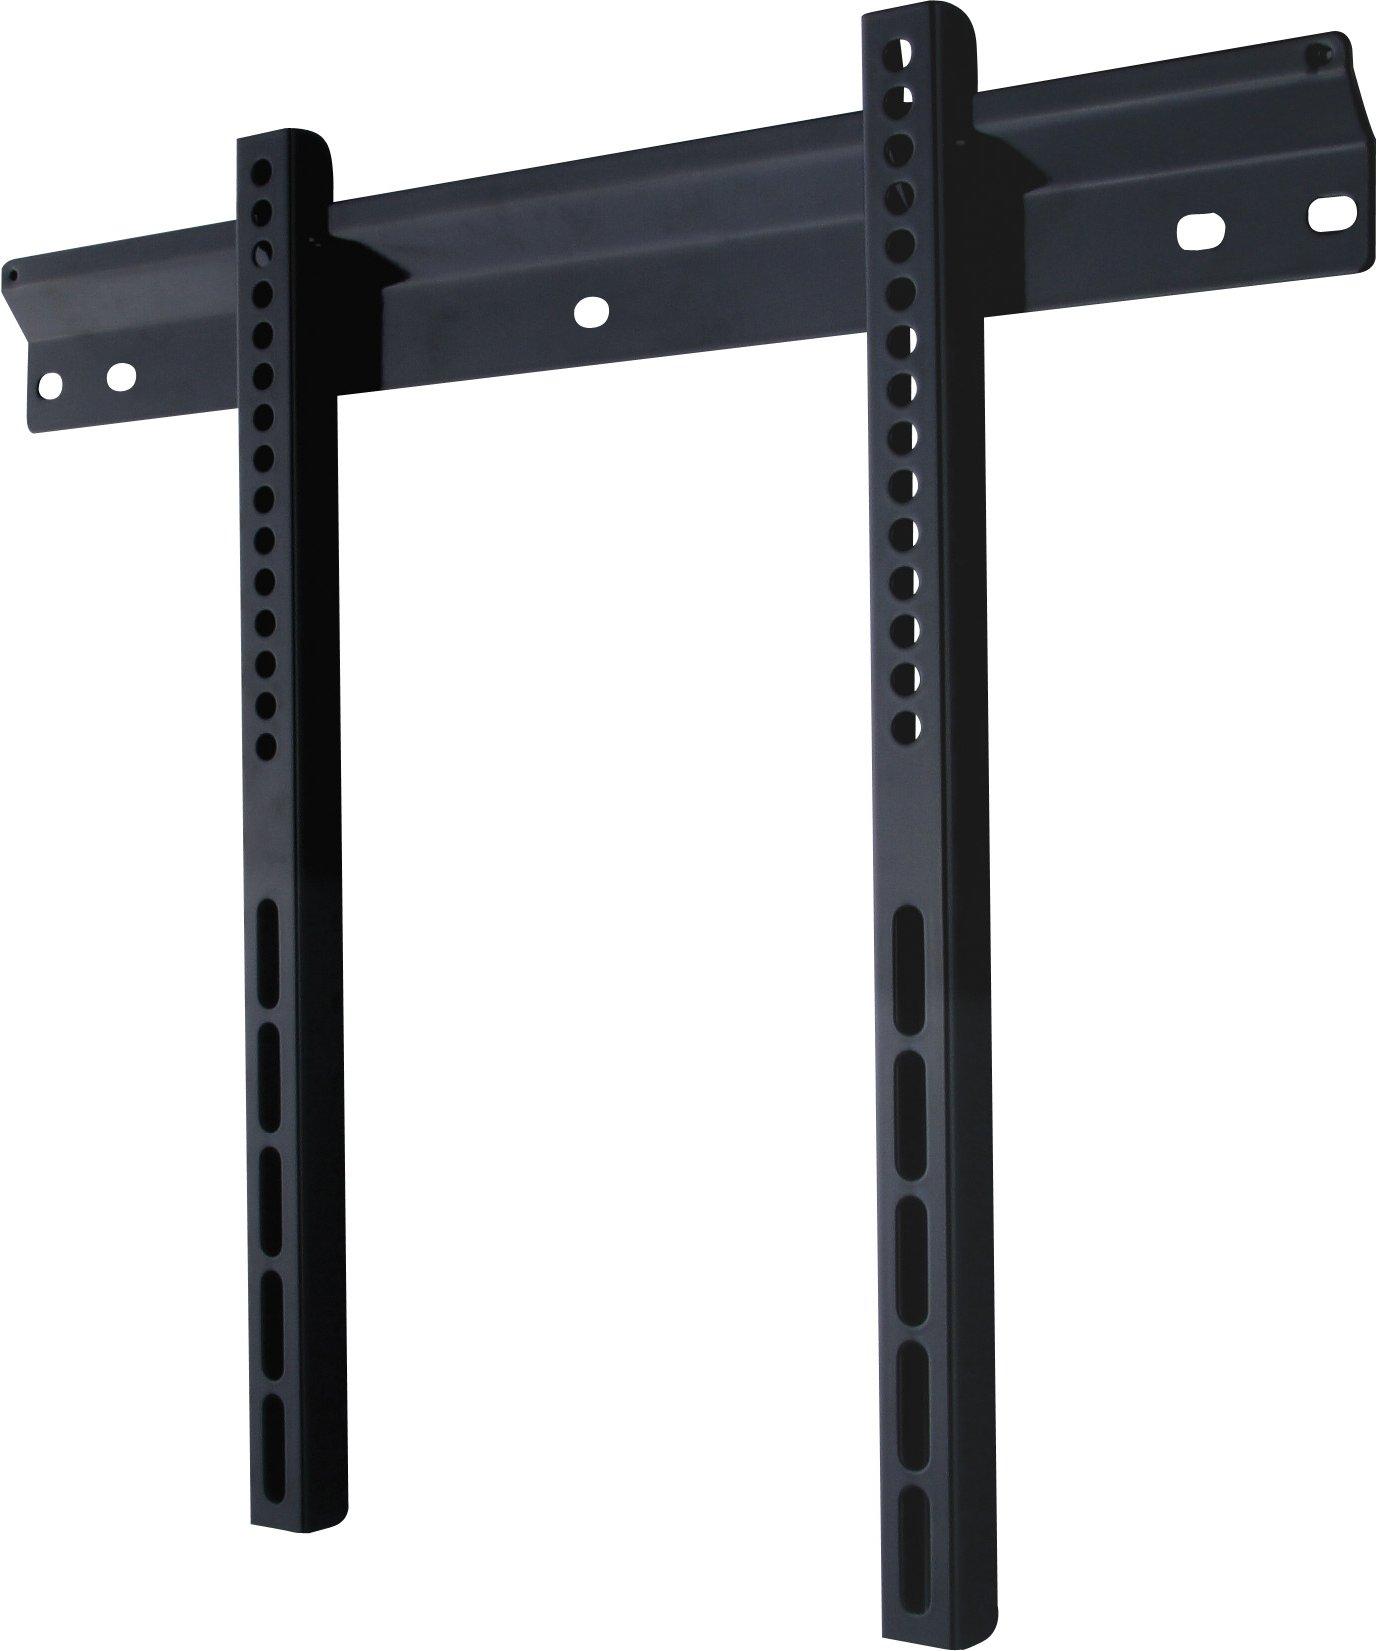 Ultimate Mounts Umf3 Ultra Slim Tv Wall Brackets